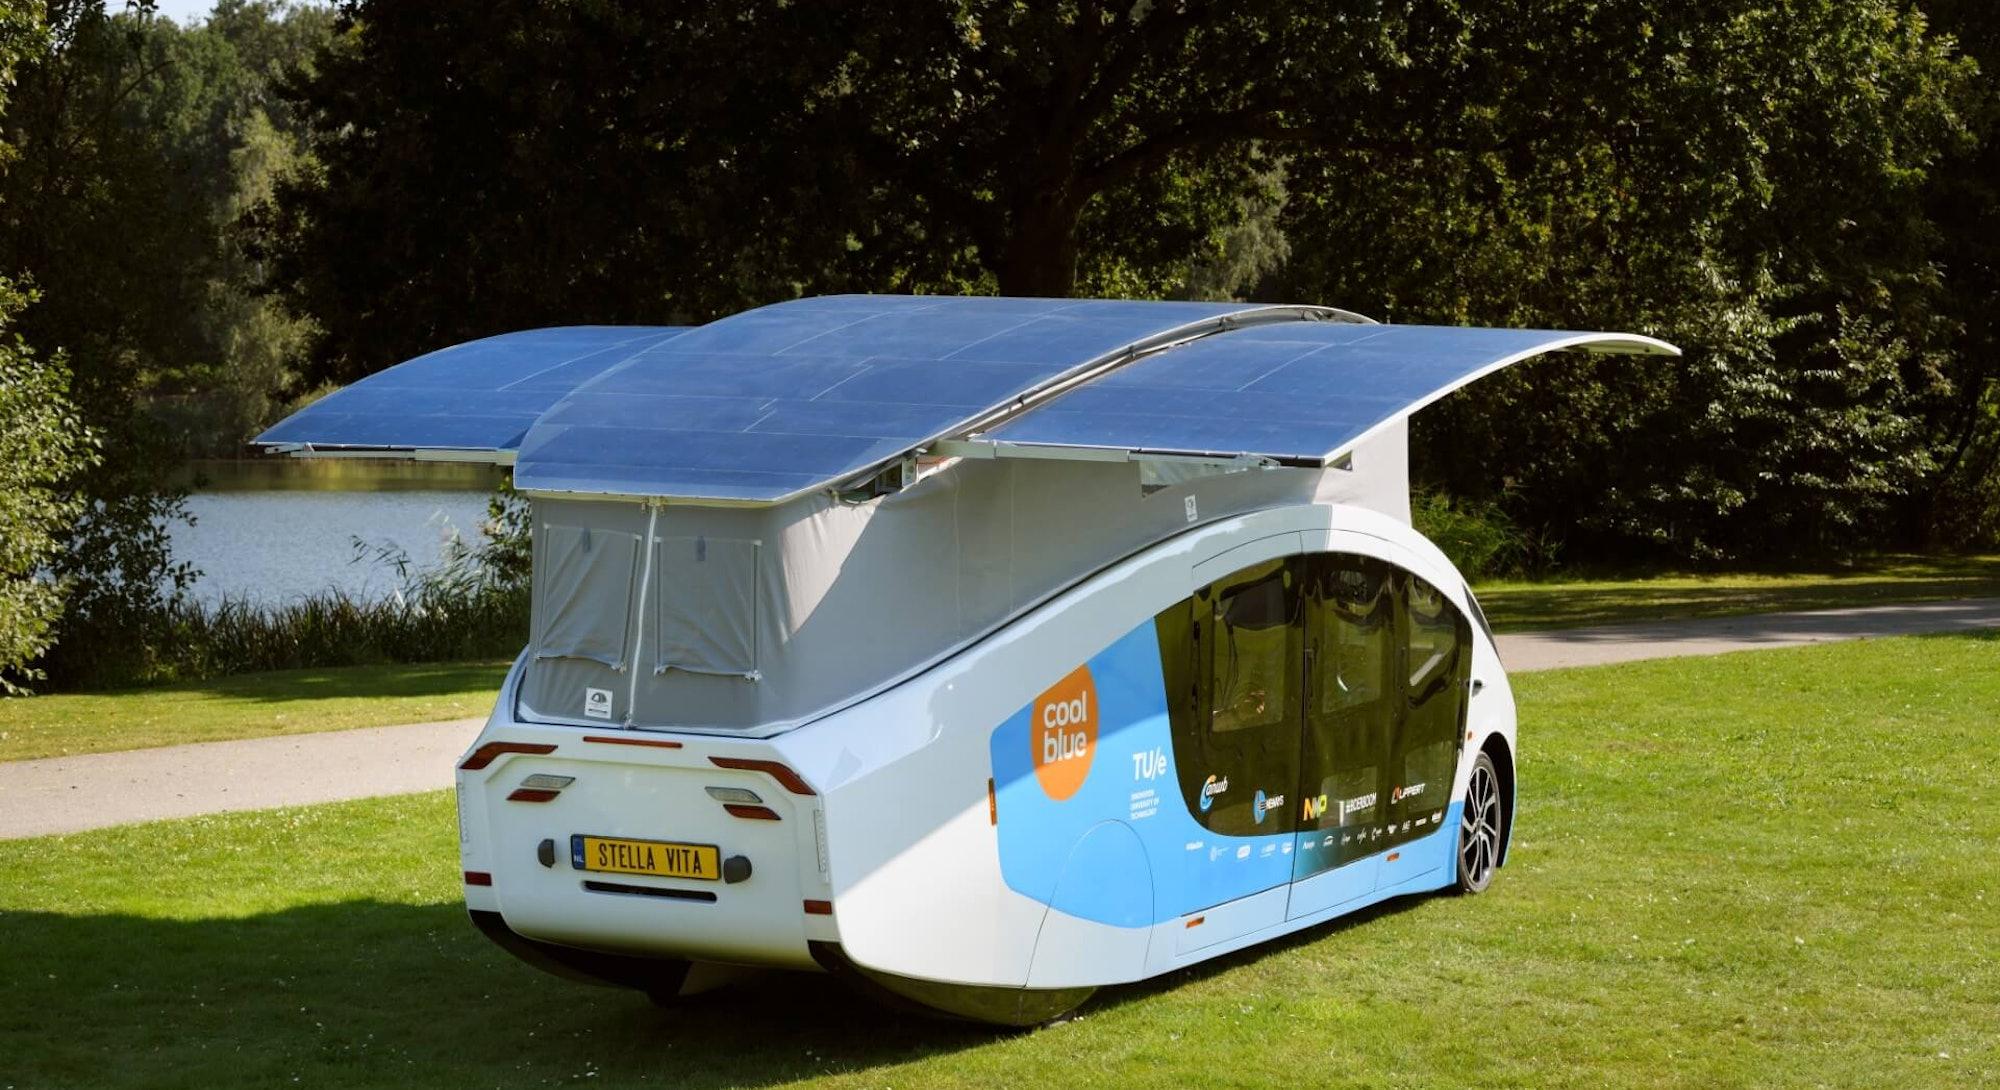 Conceptual image of the Stella Vita, an electric solar-powered RV. Electric vehicle. EV. EVs. Electr...